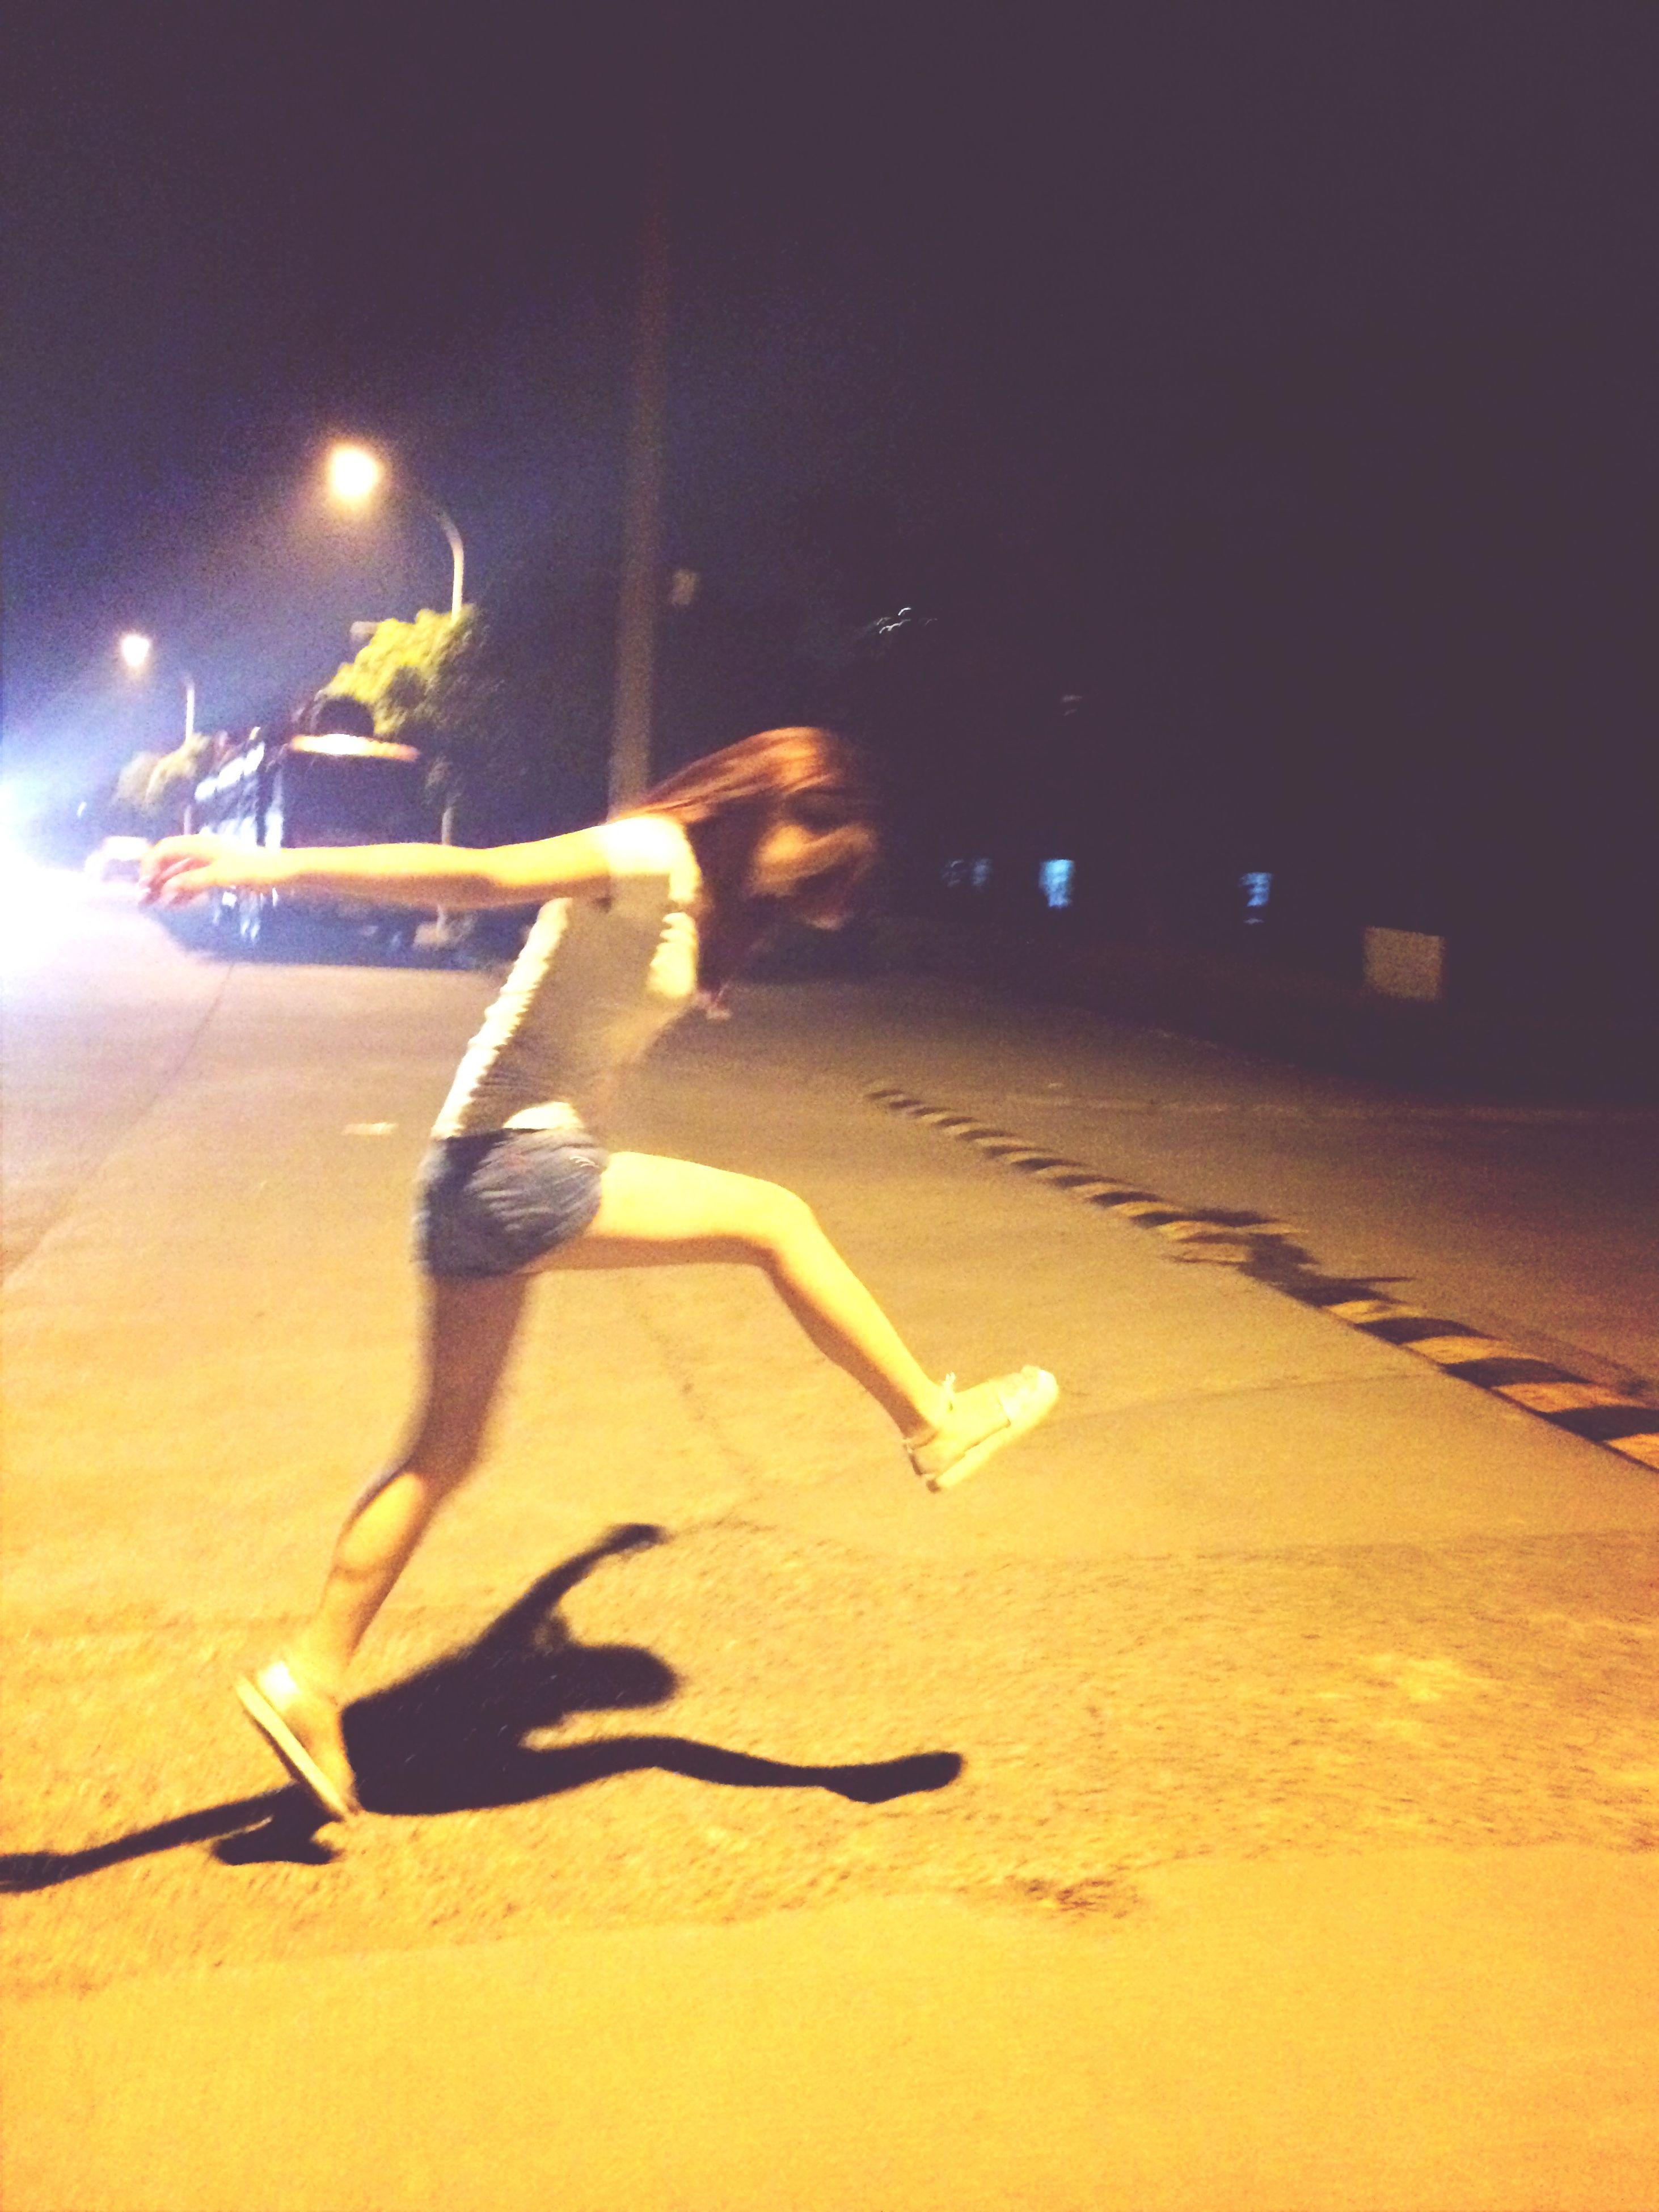 night, full length, transportation, lifestyles, street, bicycle, mode of transport, shadow, leisure activity, road, land vehicle, street light, men, walking, sunlight, illuminated, on the move, motion